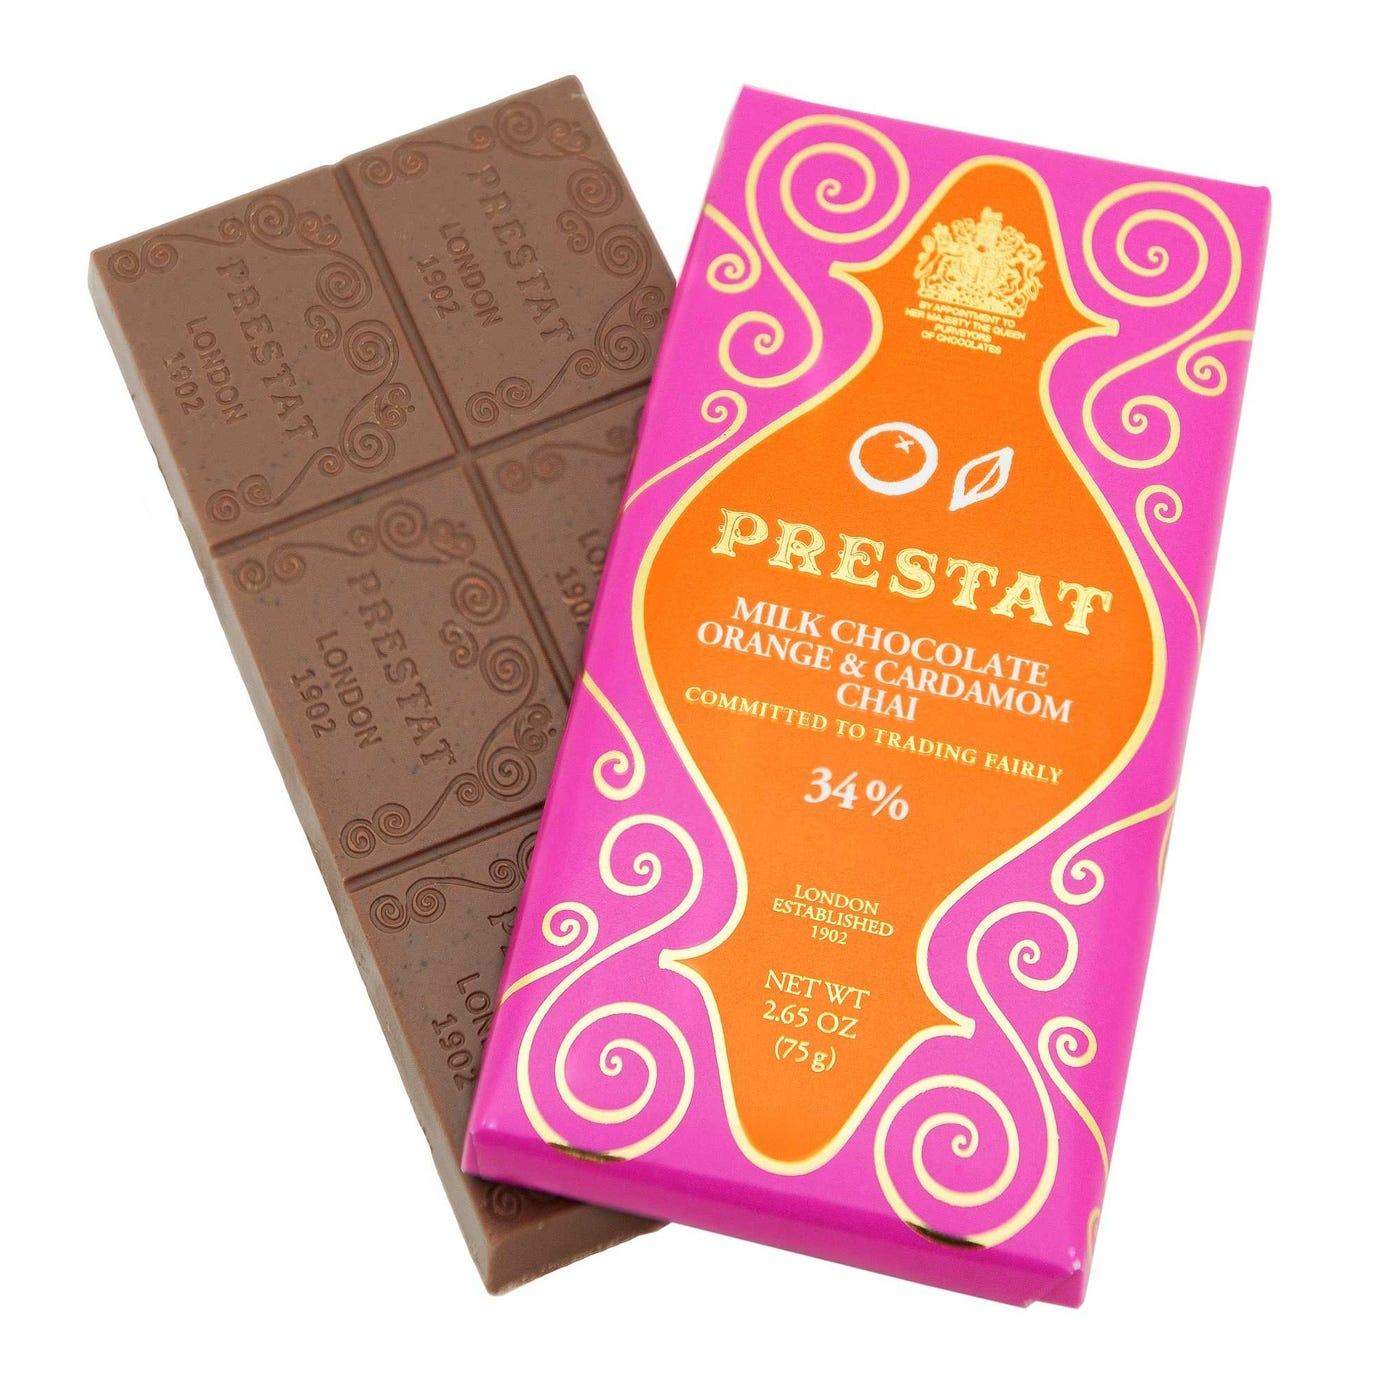 Prestat Milk Chocolate Orange & Cardamom Chai Bar 75g